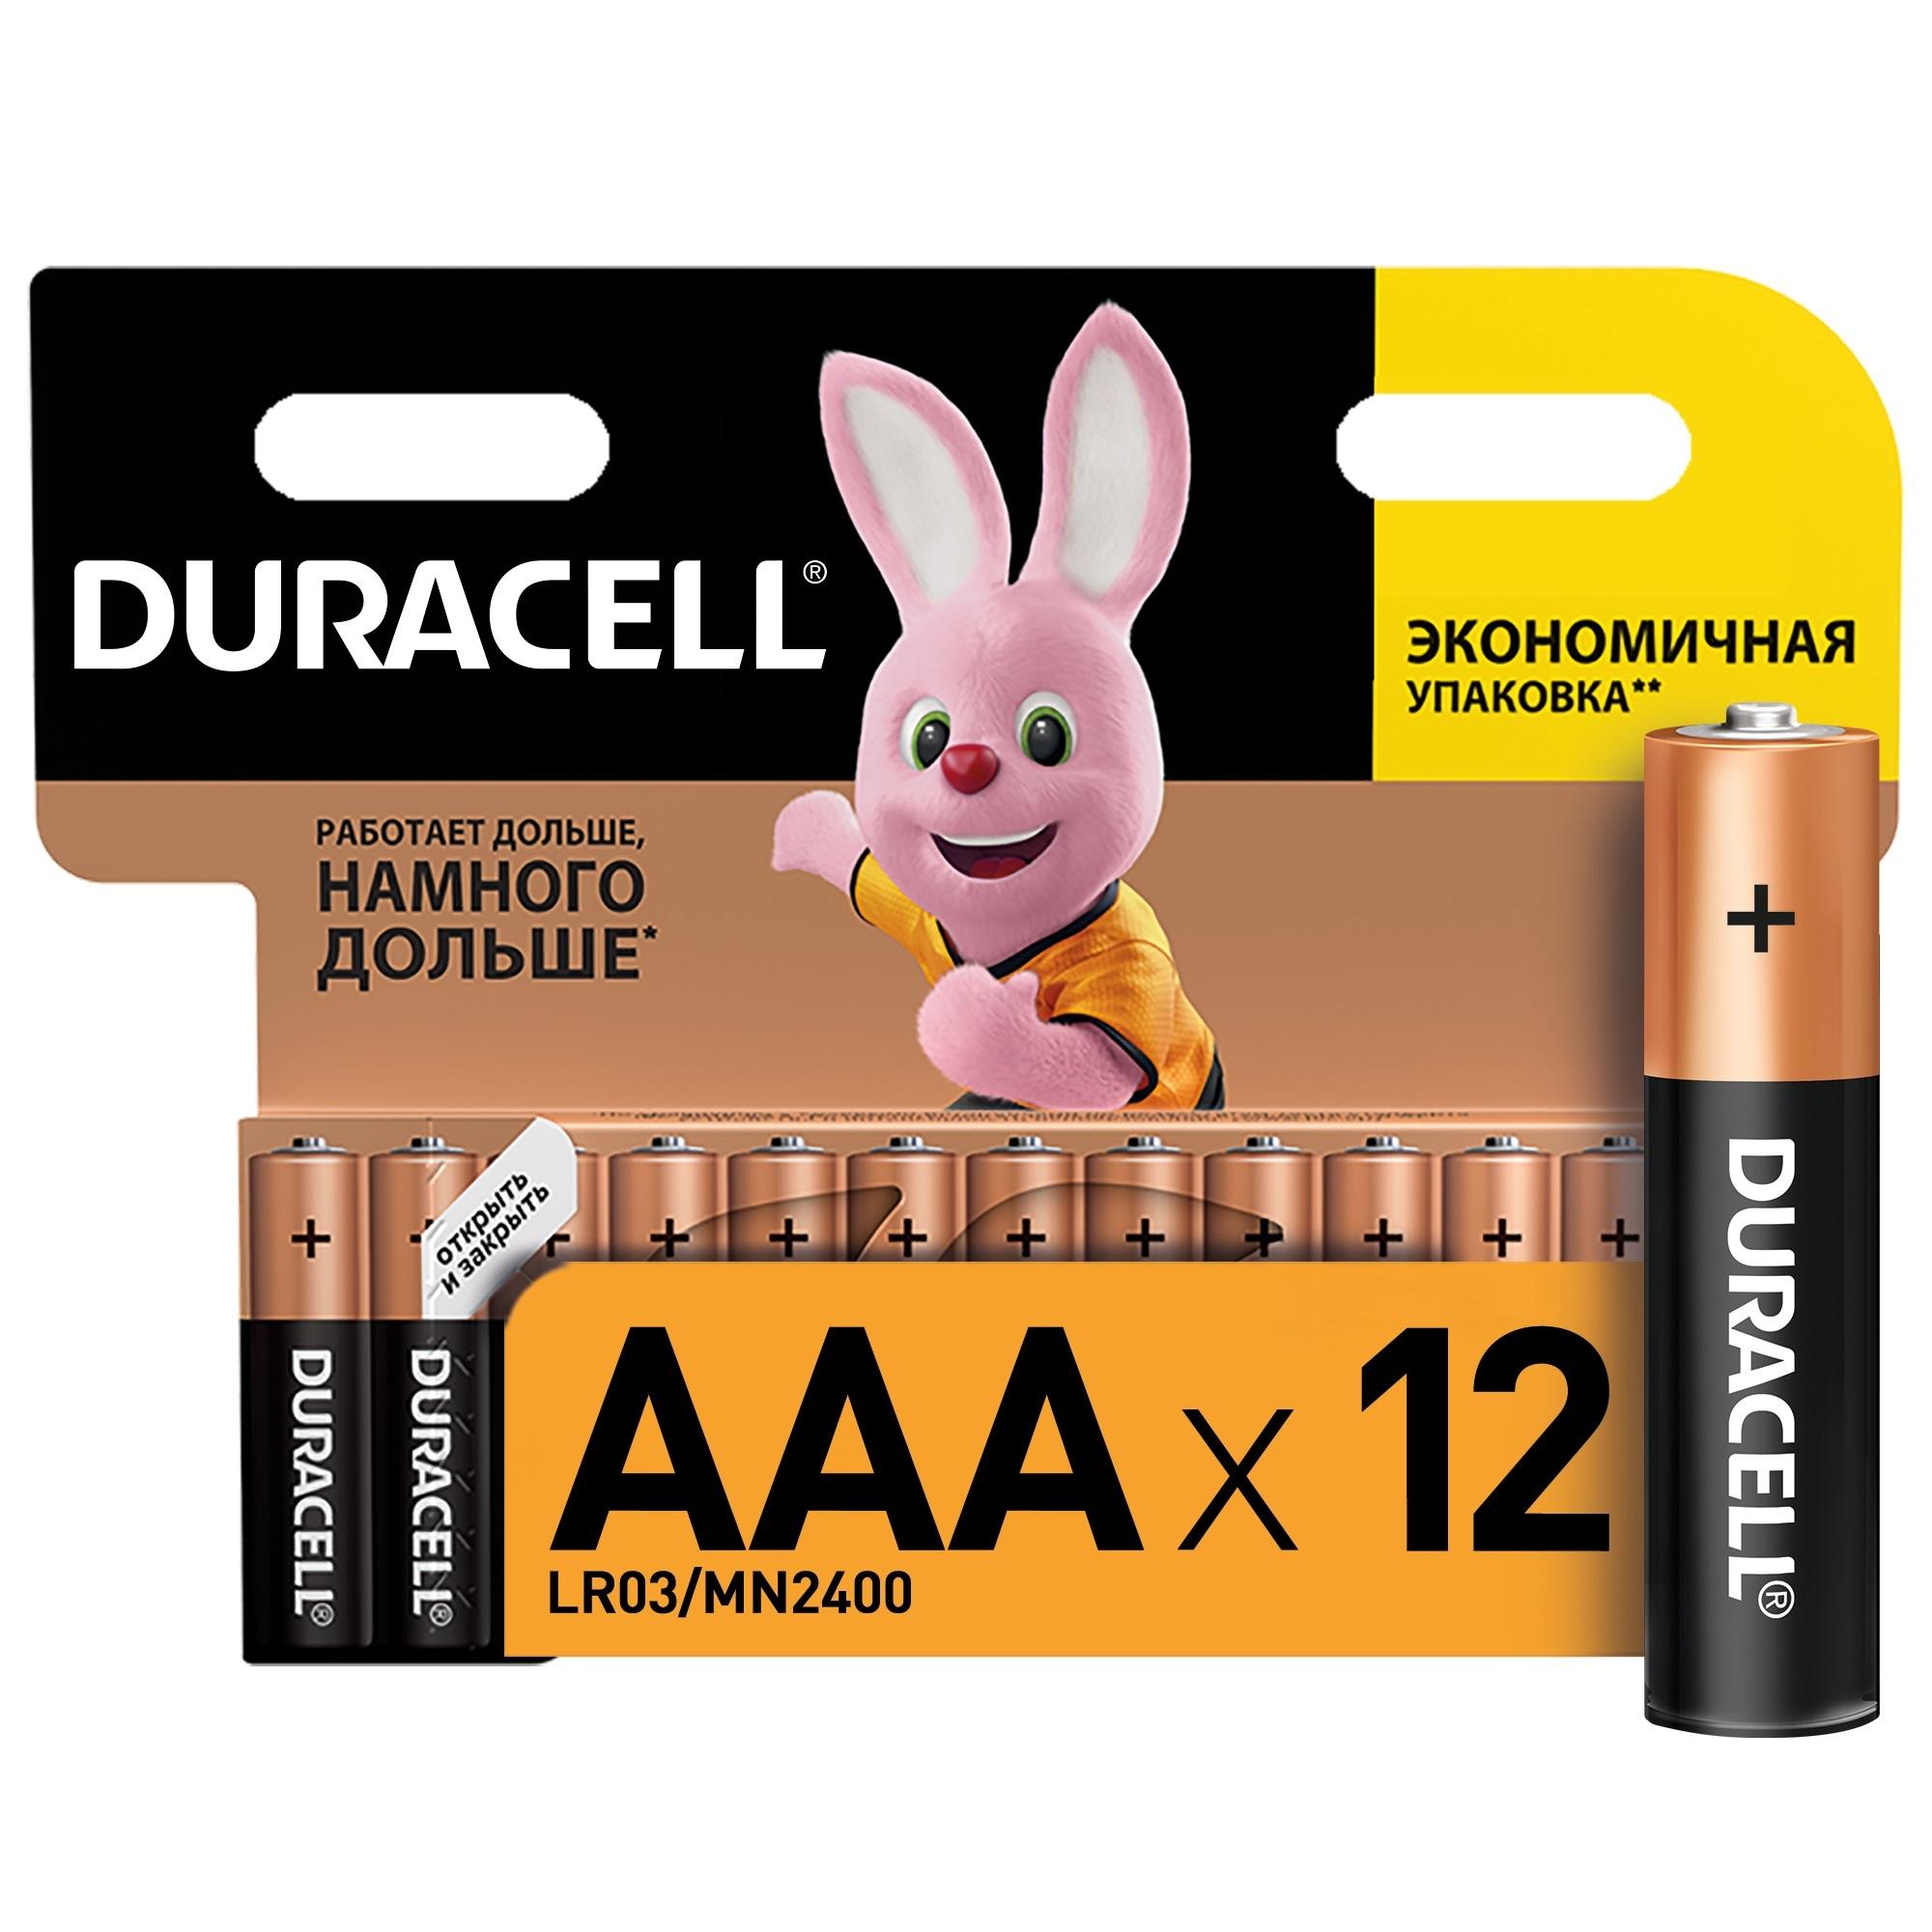 Батарейки Duracell AAA 1,5В 12 шт фото